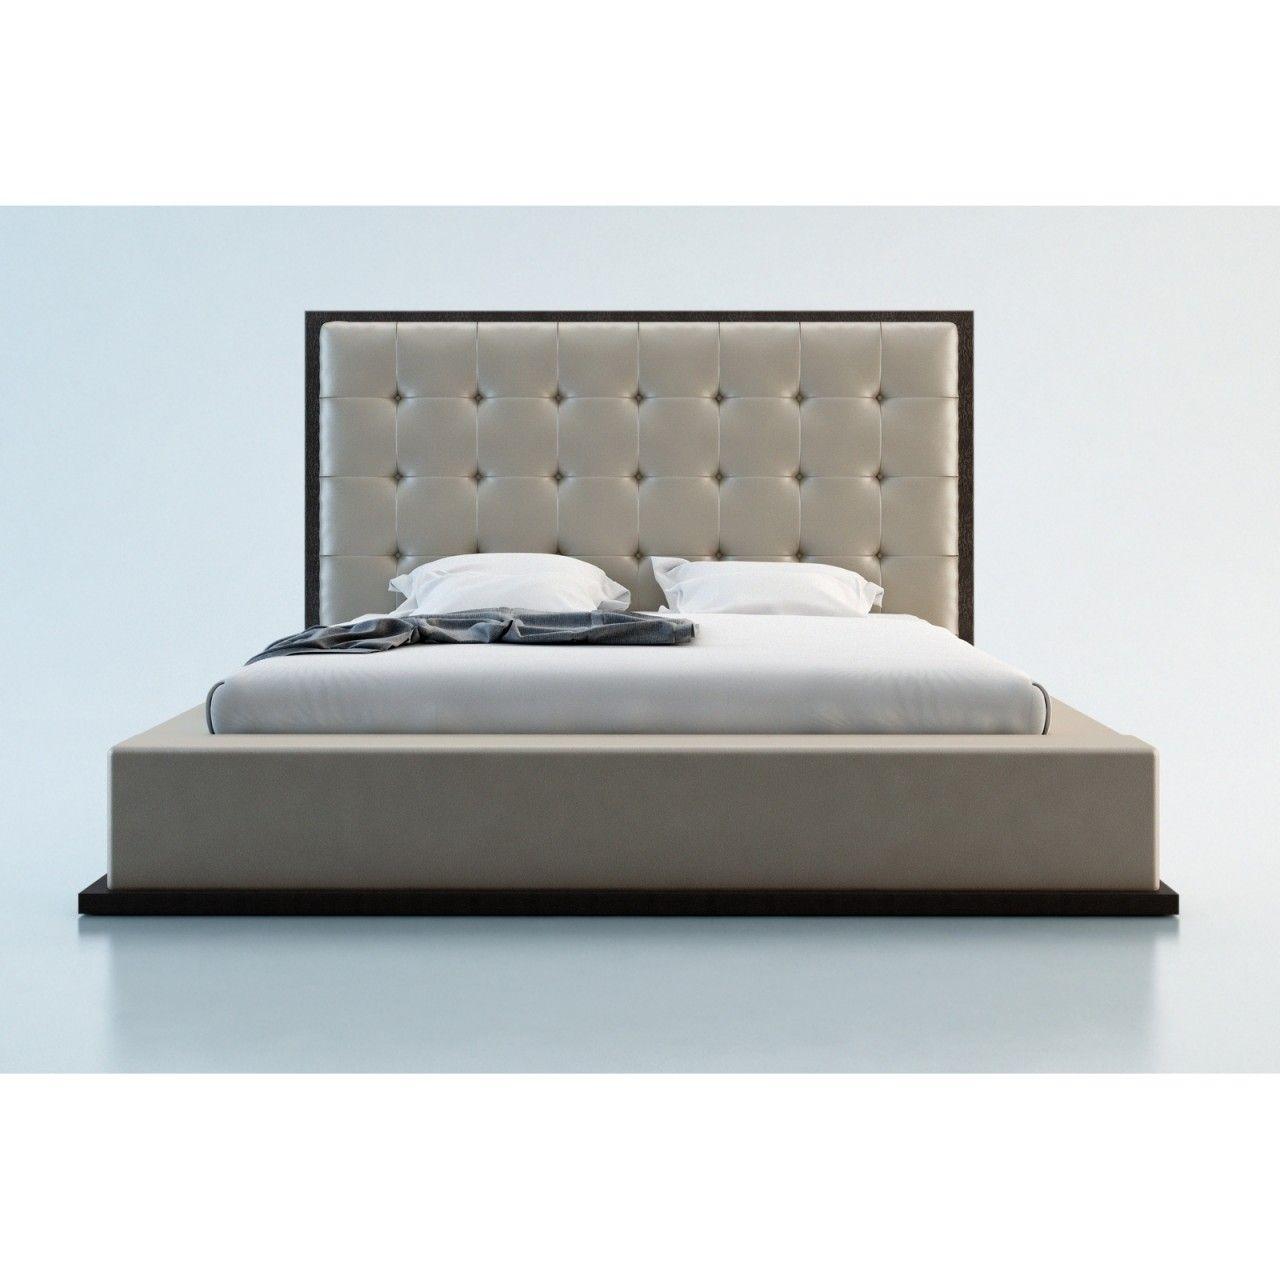 Modern platform bed store ludlow platform bed queen wengedusty